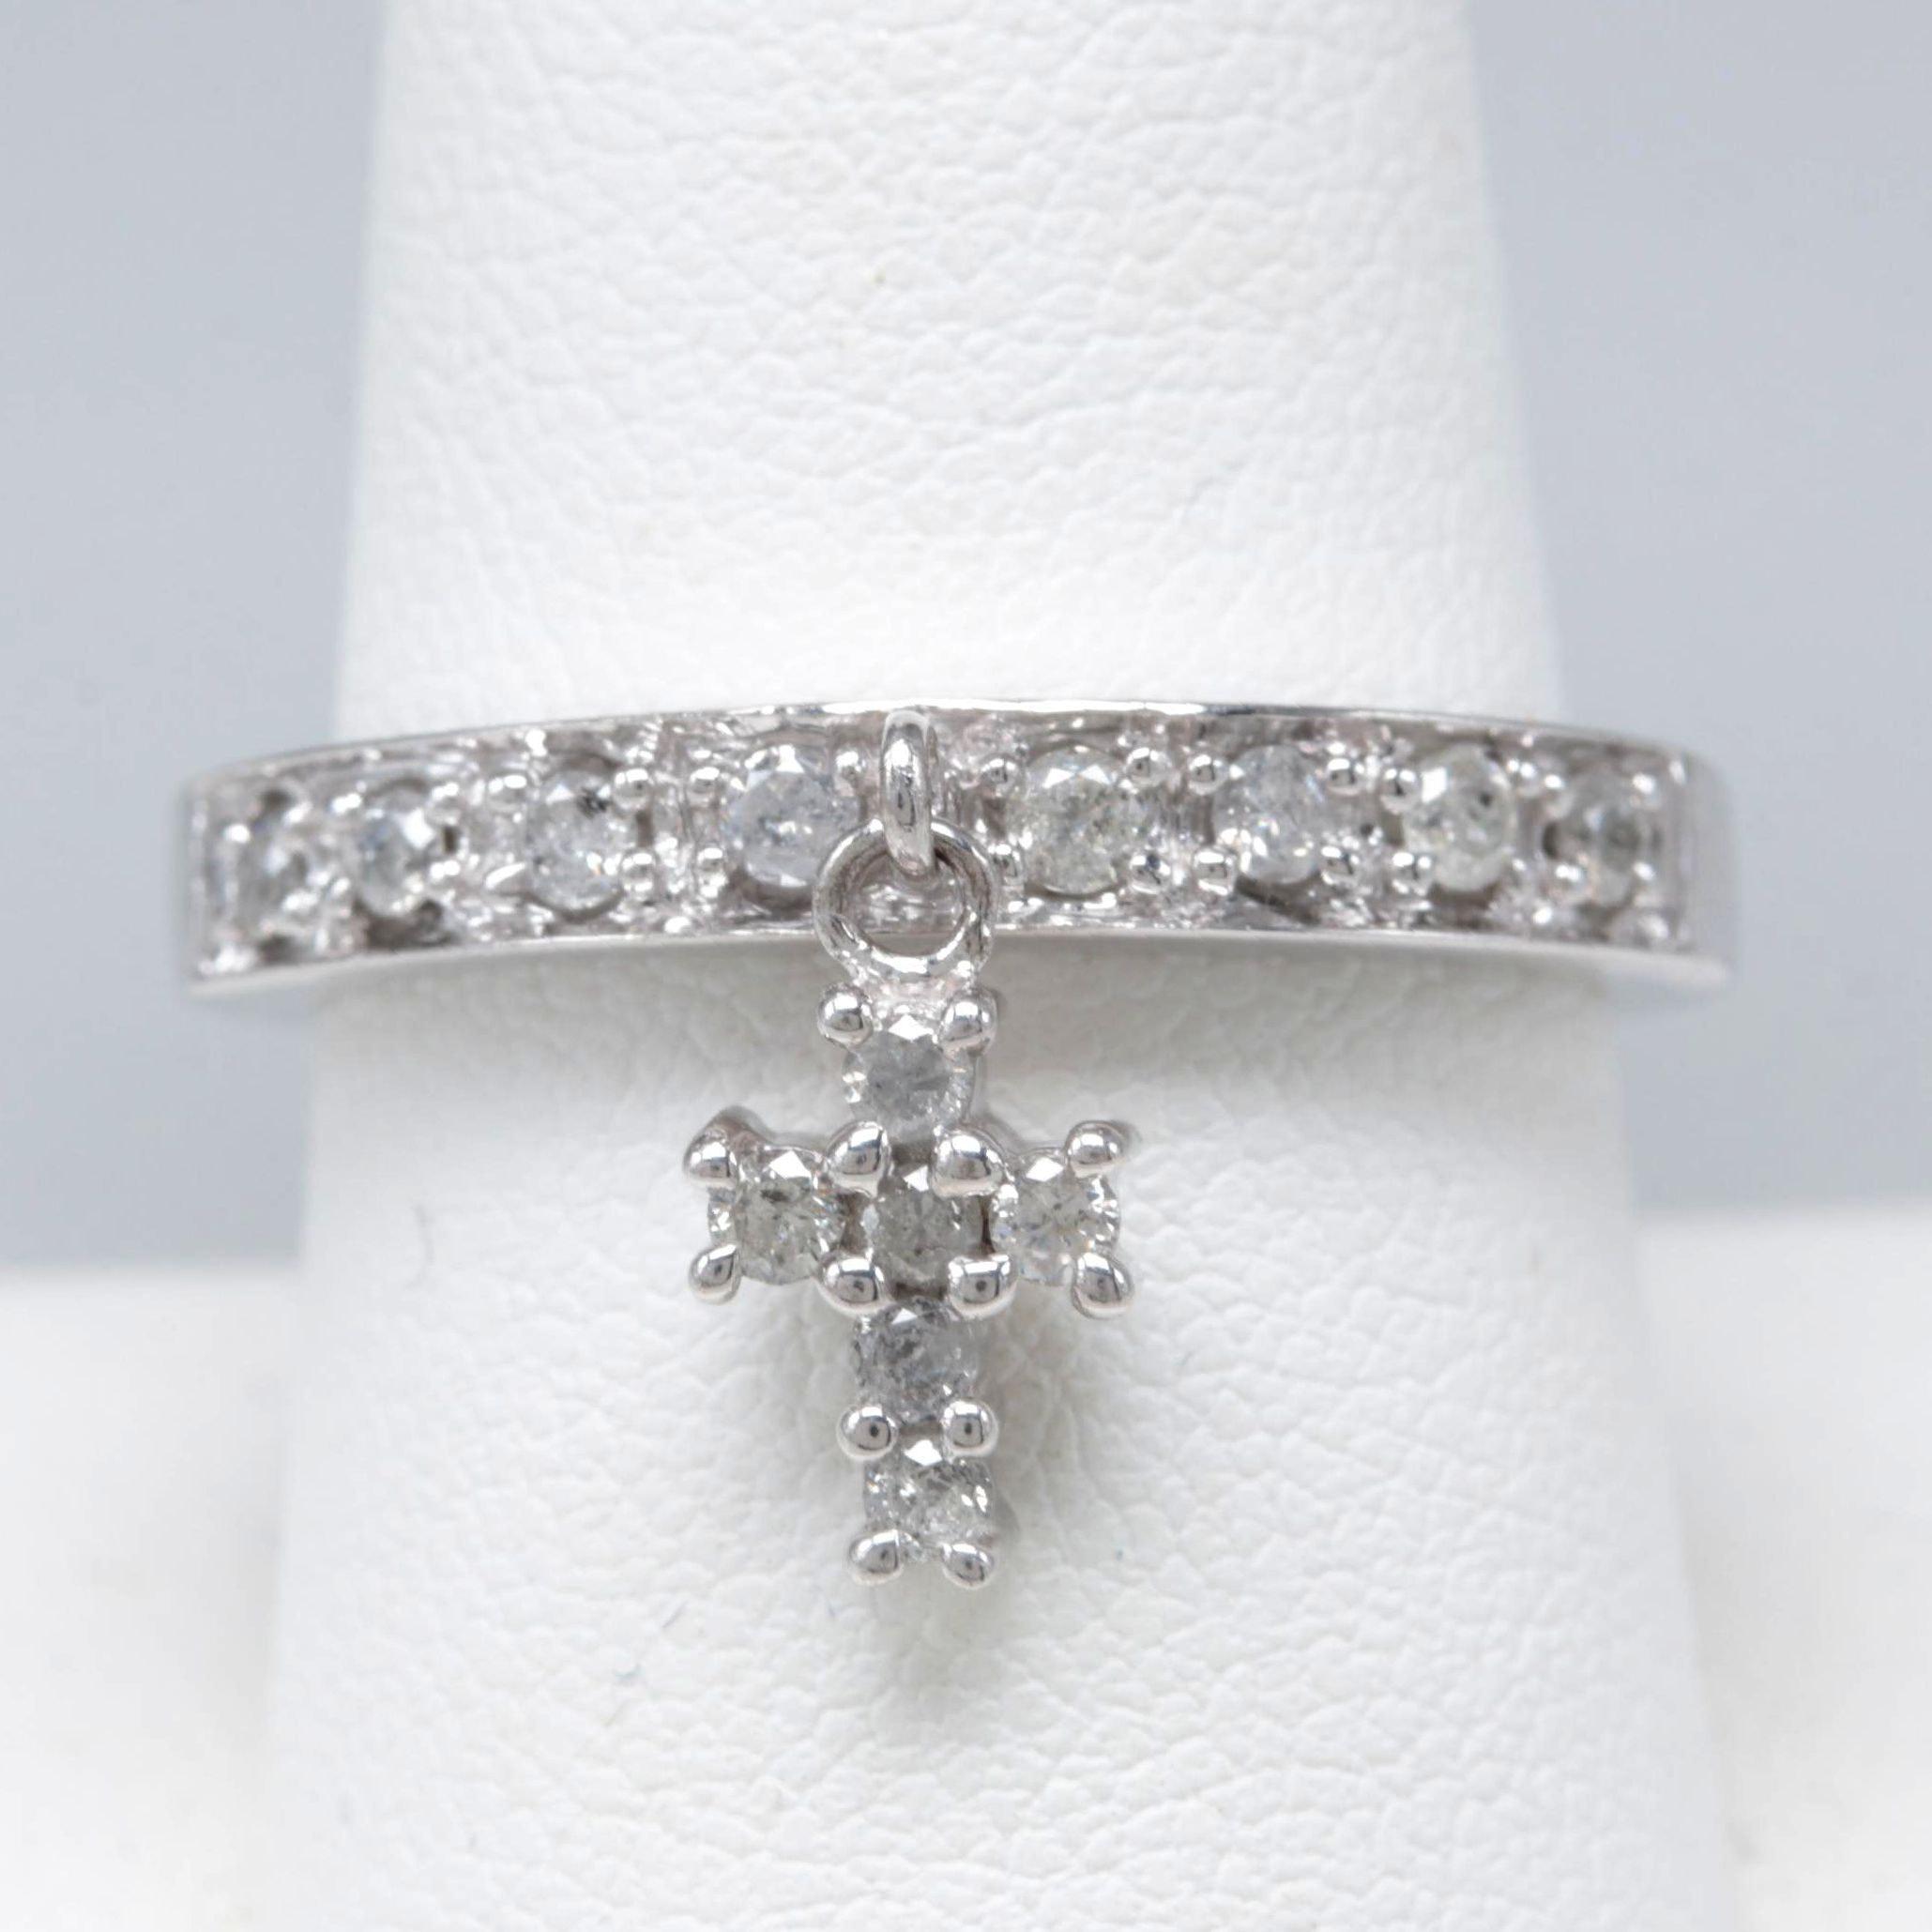 Sterling Silver Diamond Cross Charm Ring